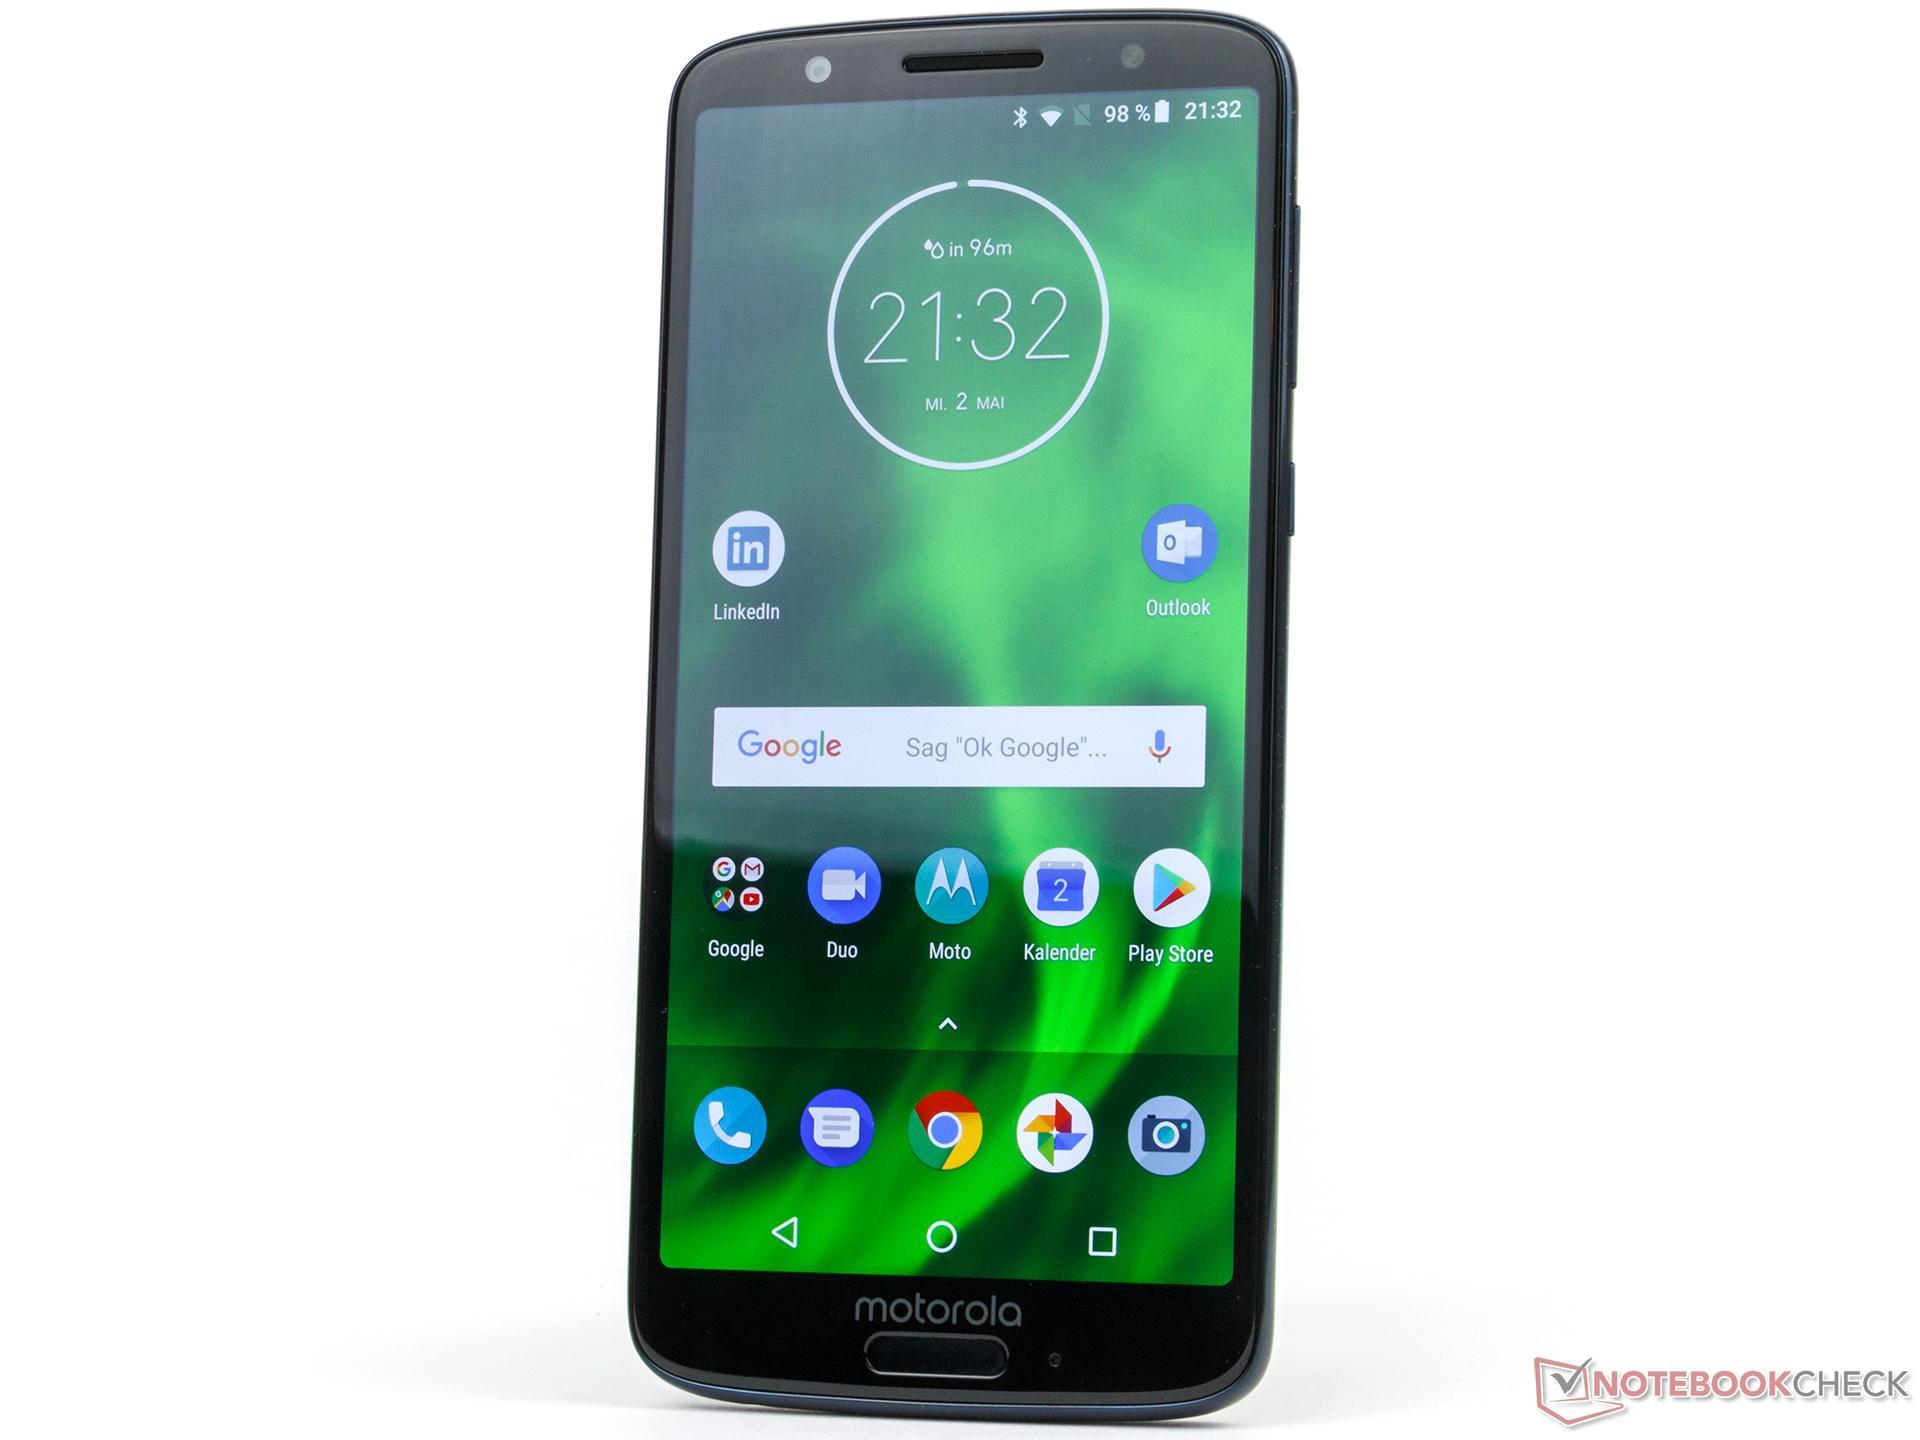 Motorola Moto G6 Smartphone Review - NotebookCheck.net Reviews